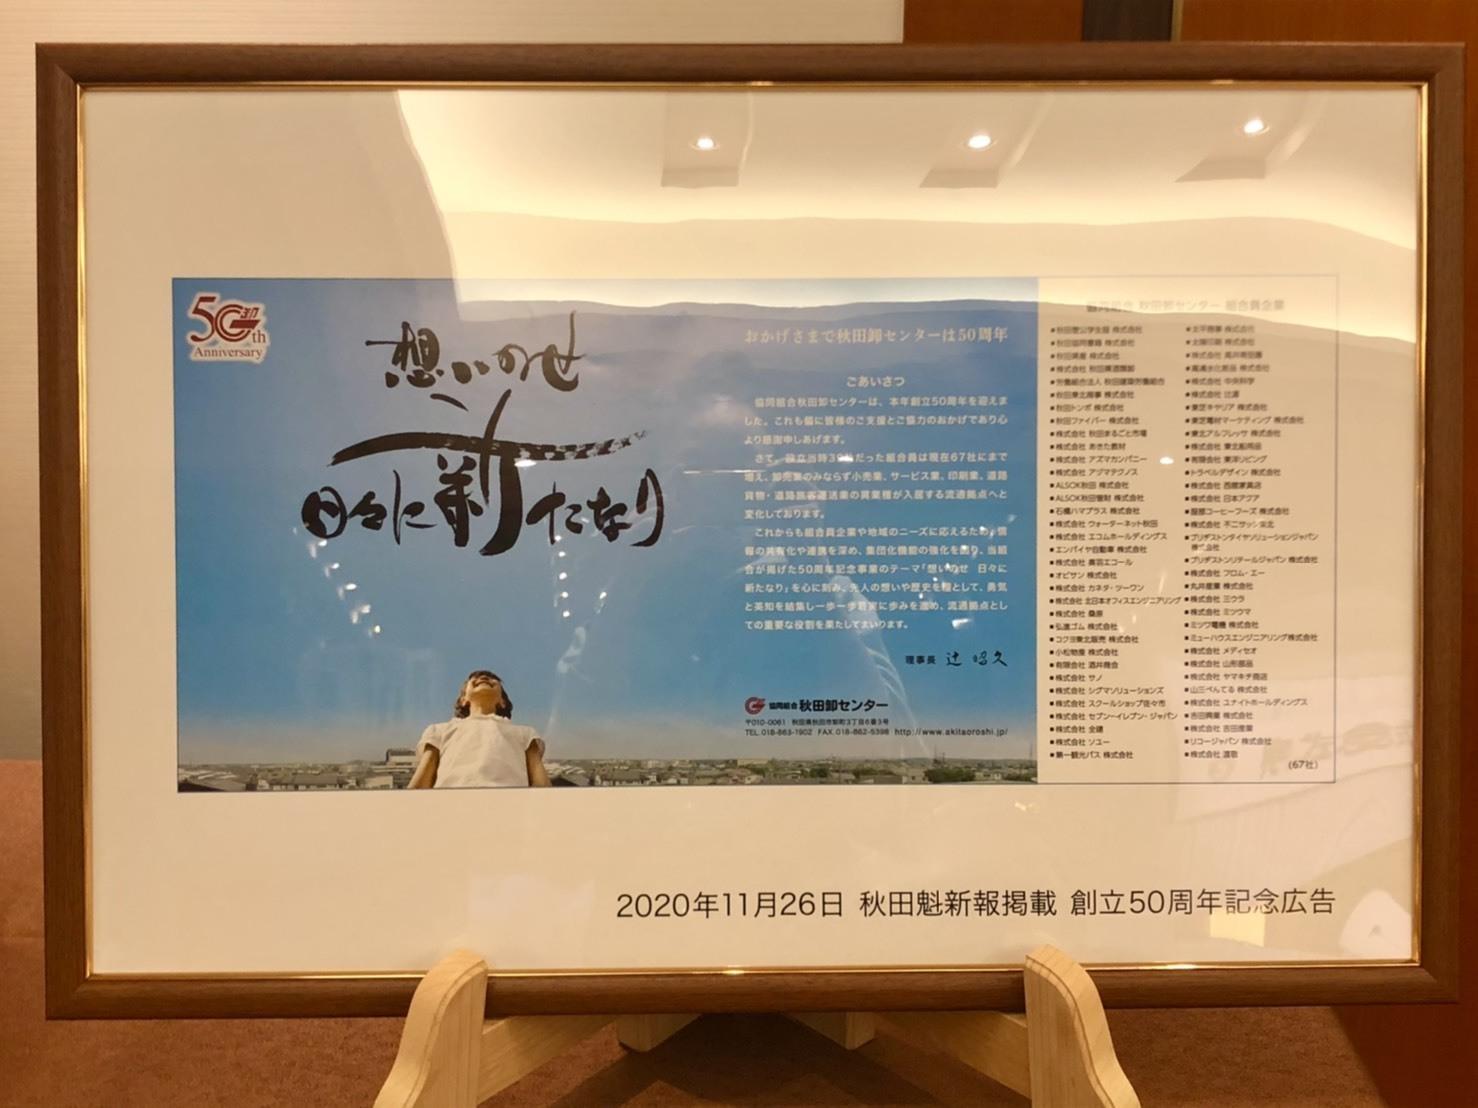 秋田卸センター様 創立50周年記念式典_e0197227_19240968.jpeg